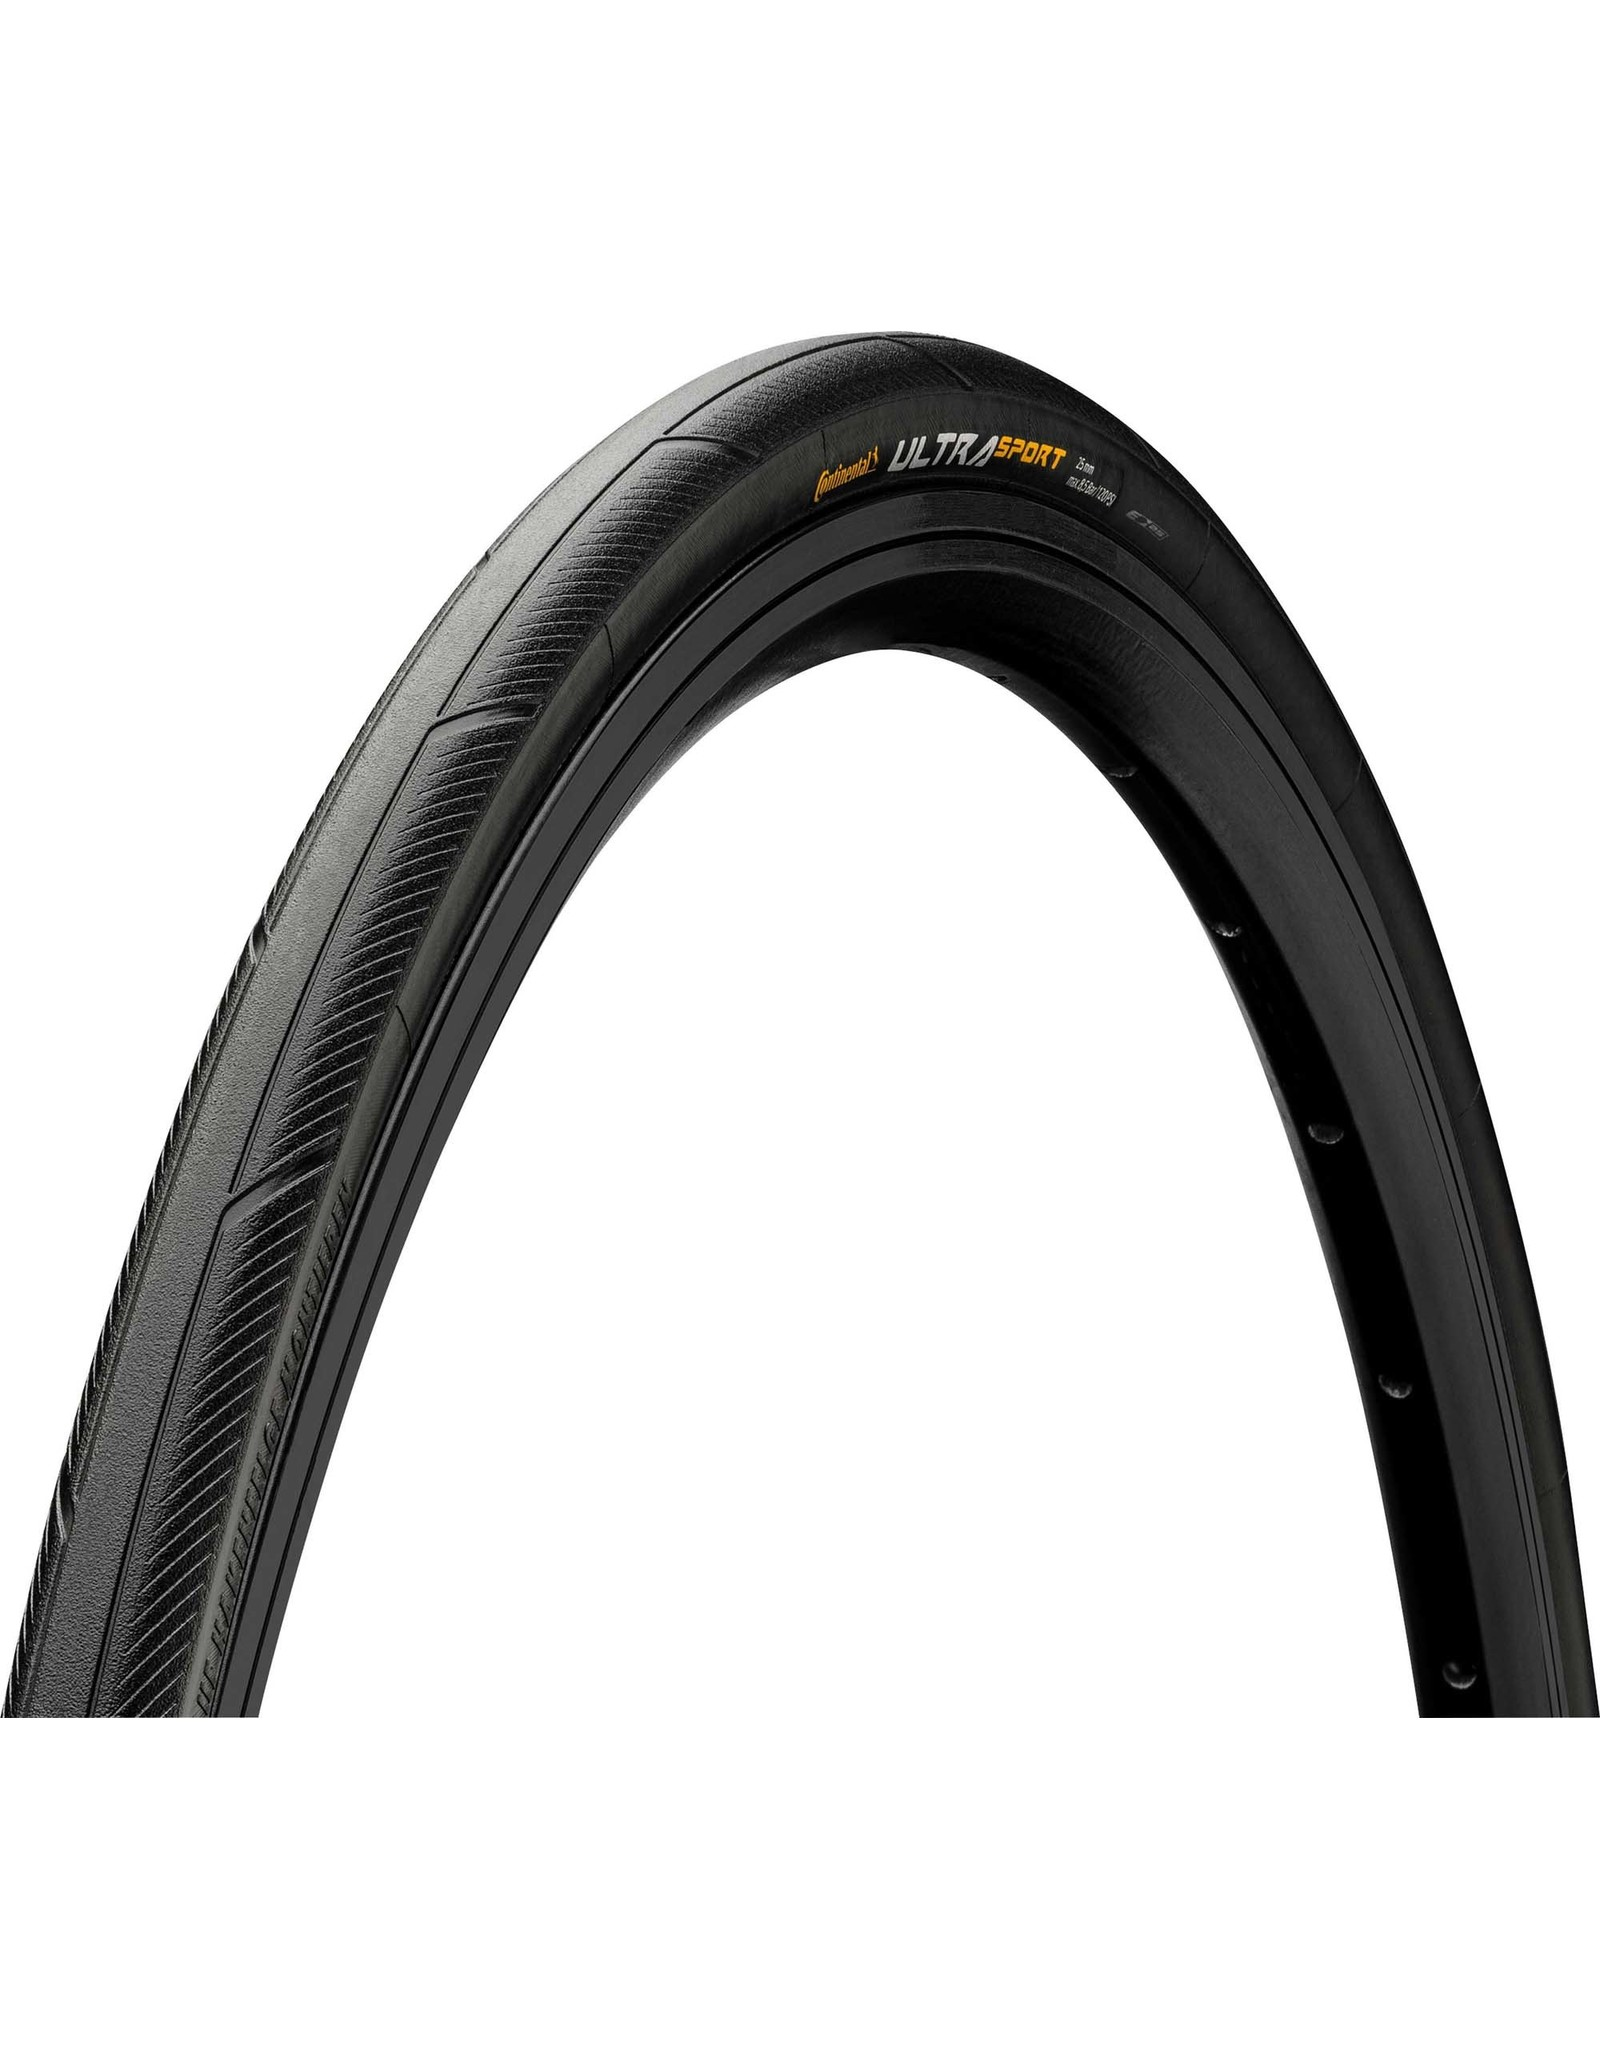 Continental Continental Ultra Sport III Tire - 27 x 1.25 (1/4), Clincher, Wire, Black